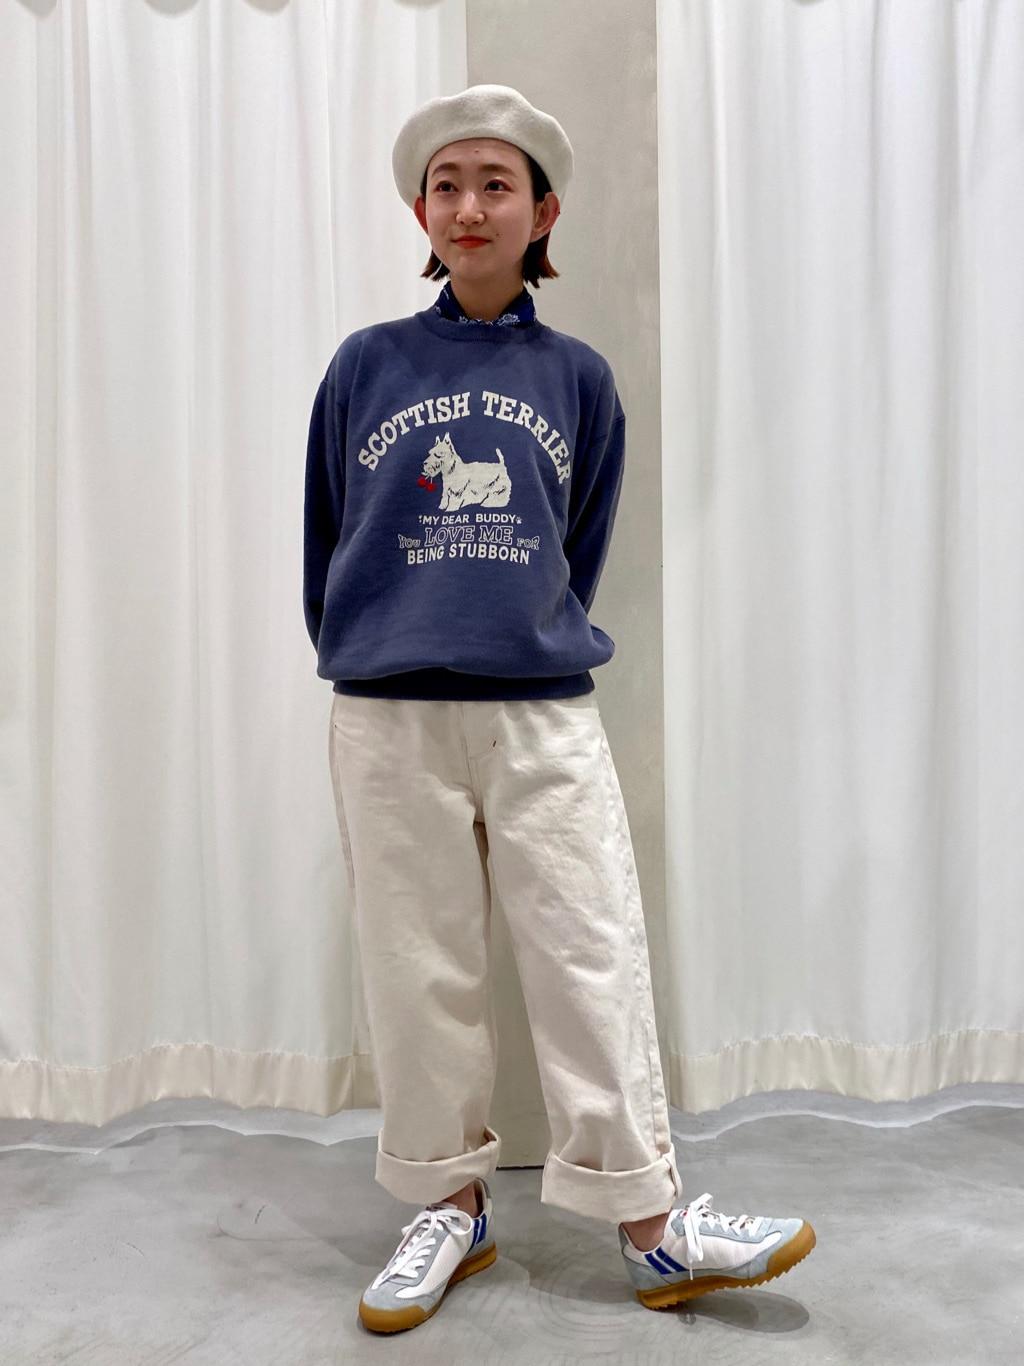 - CHILD WOMAN CHILD WOMAN , PAR ICI 東京スカイツリータウン・ソラマチ 身長:150cm 2020.09.12